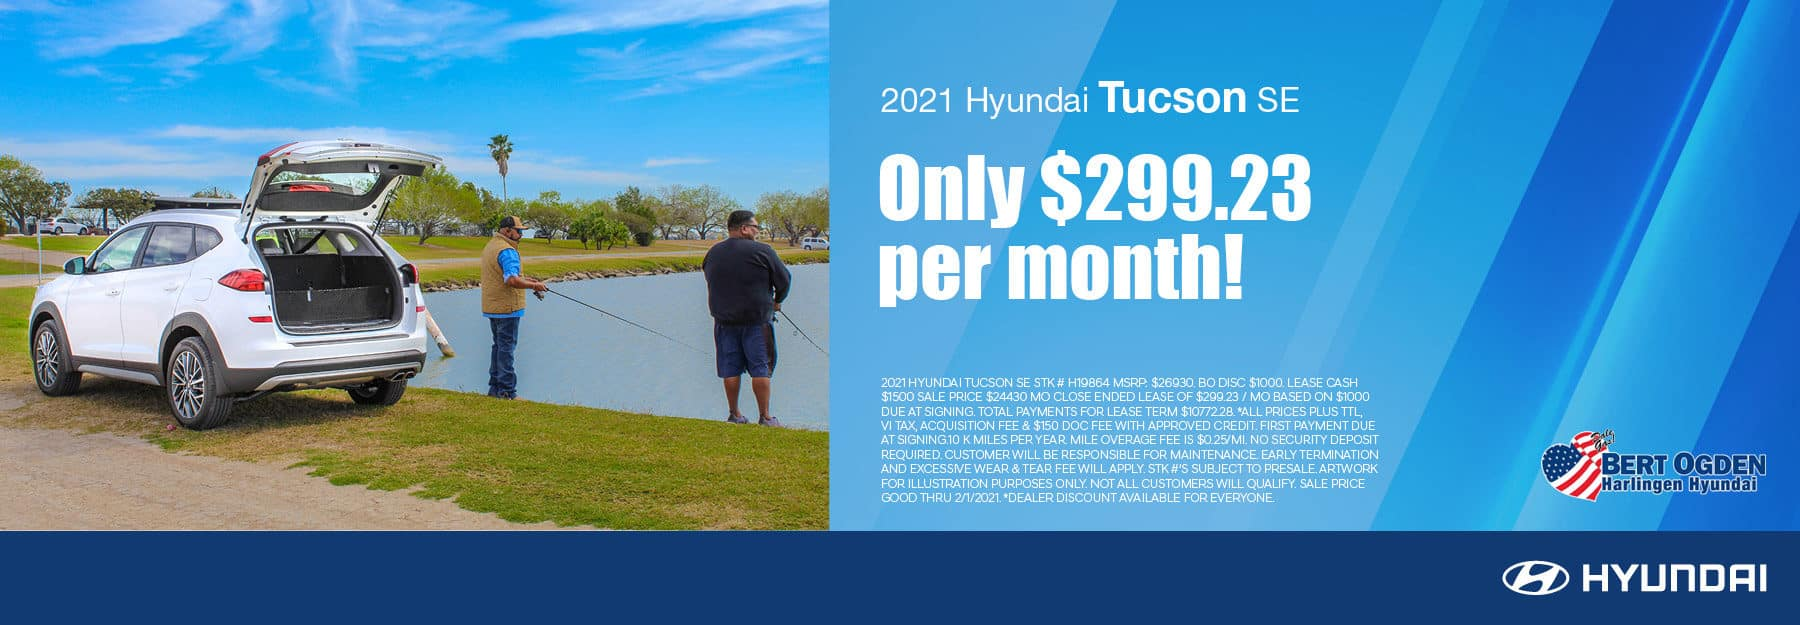 2021 Hyundai Tucson | Bert Ogden Hyundai | Harlingen, TX